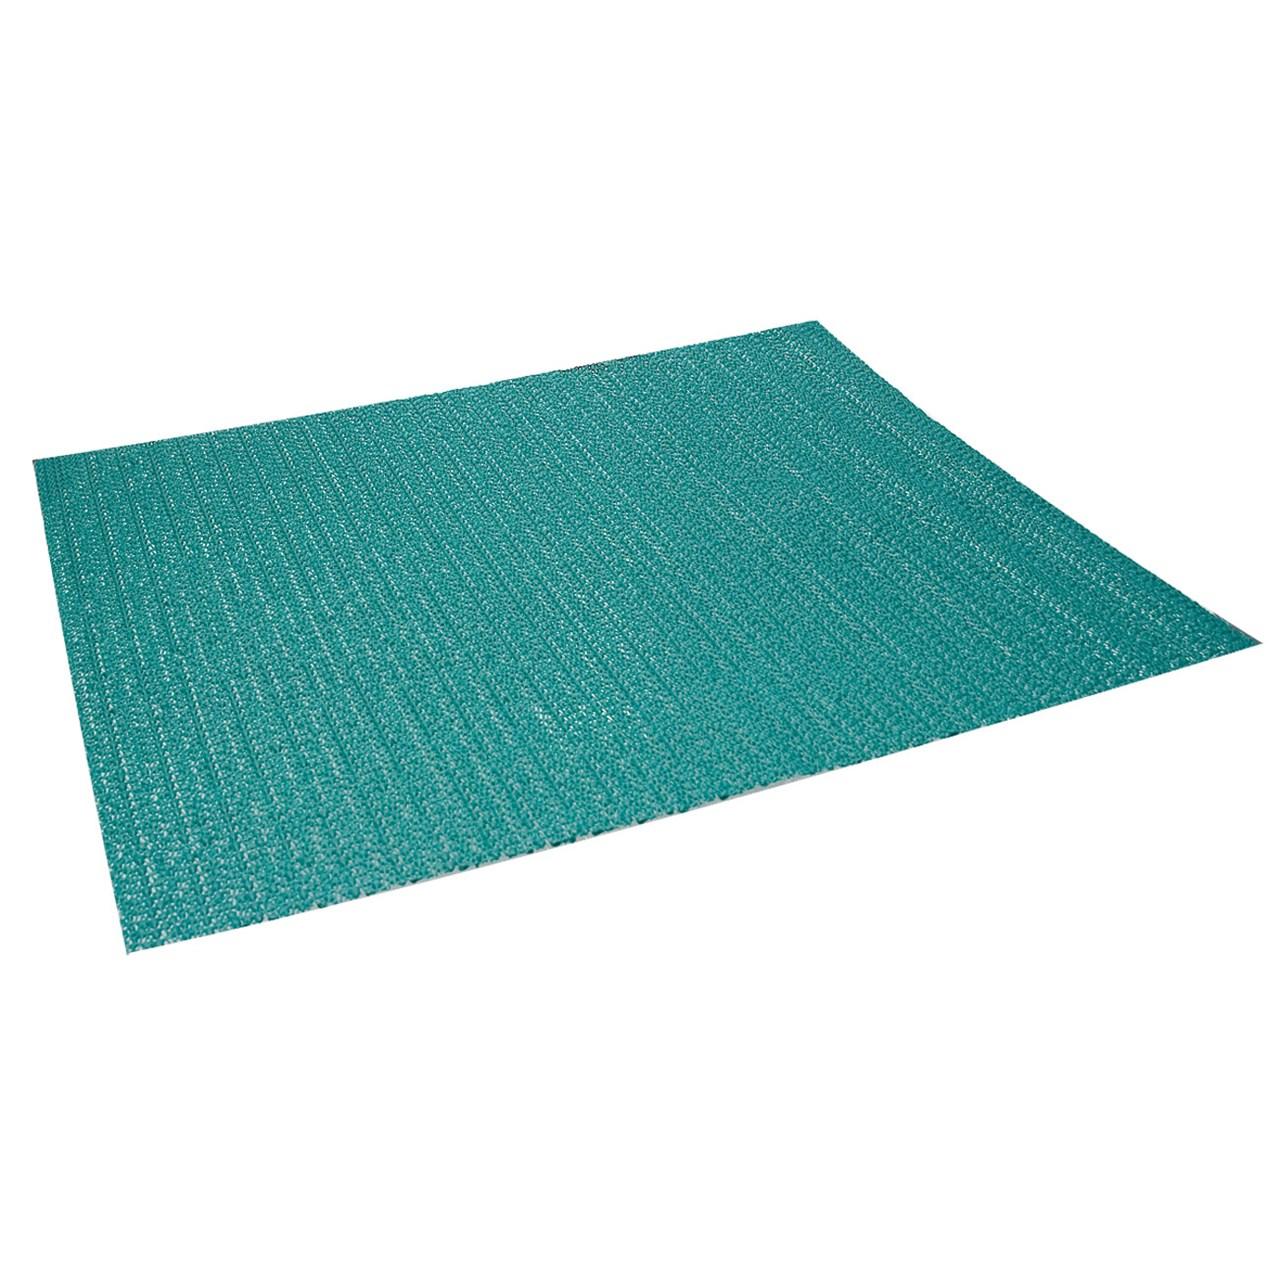 ip trademark mat walmart glow non com slip home pieces dark the in